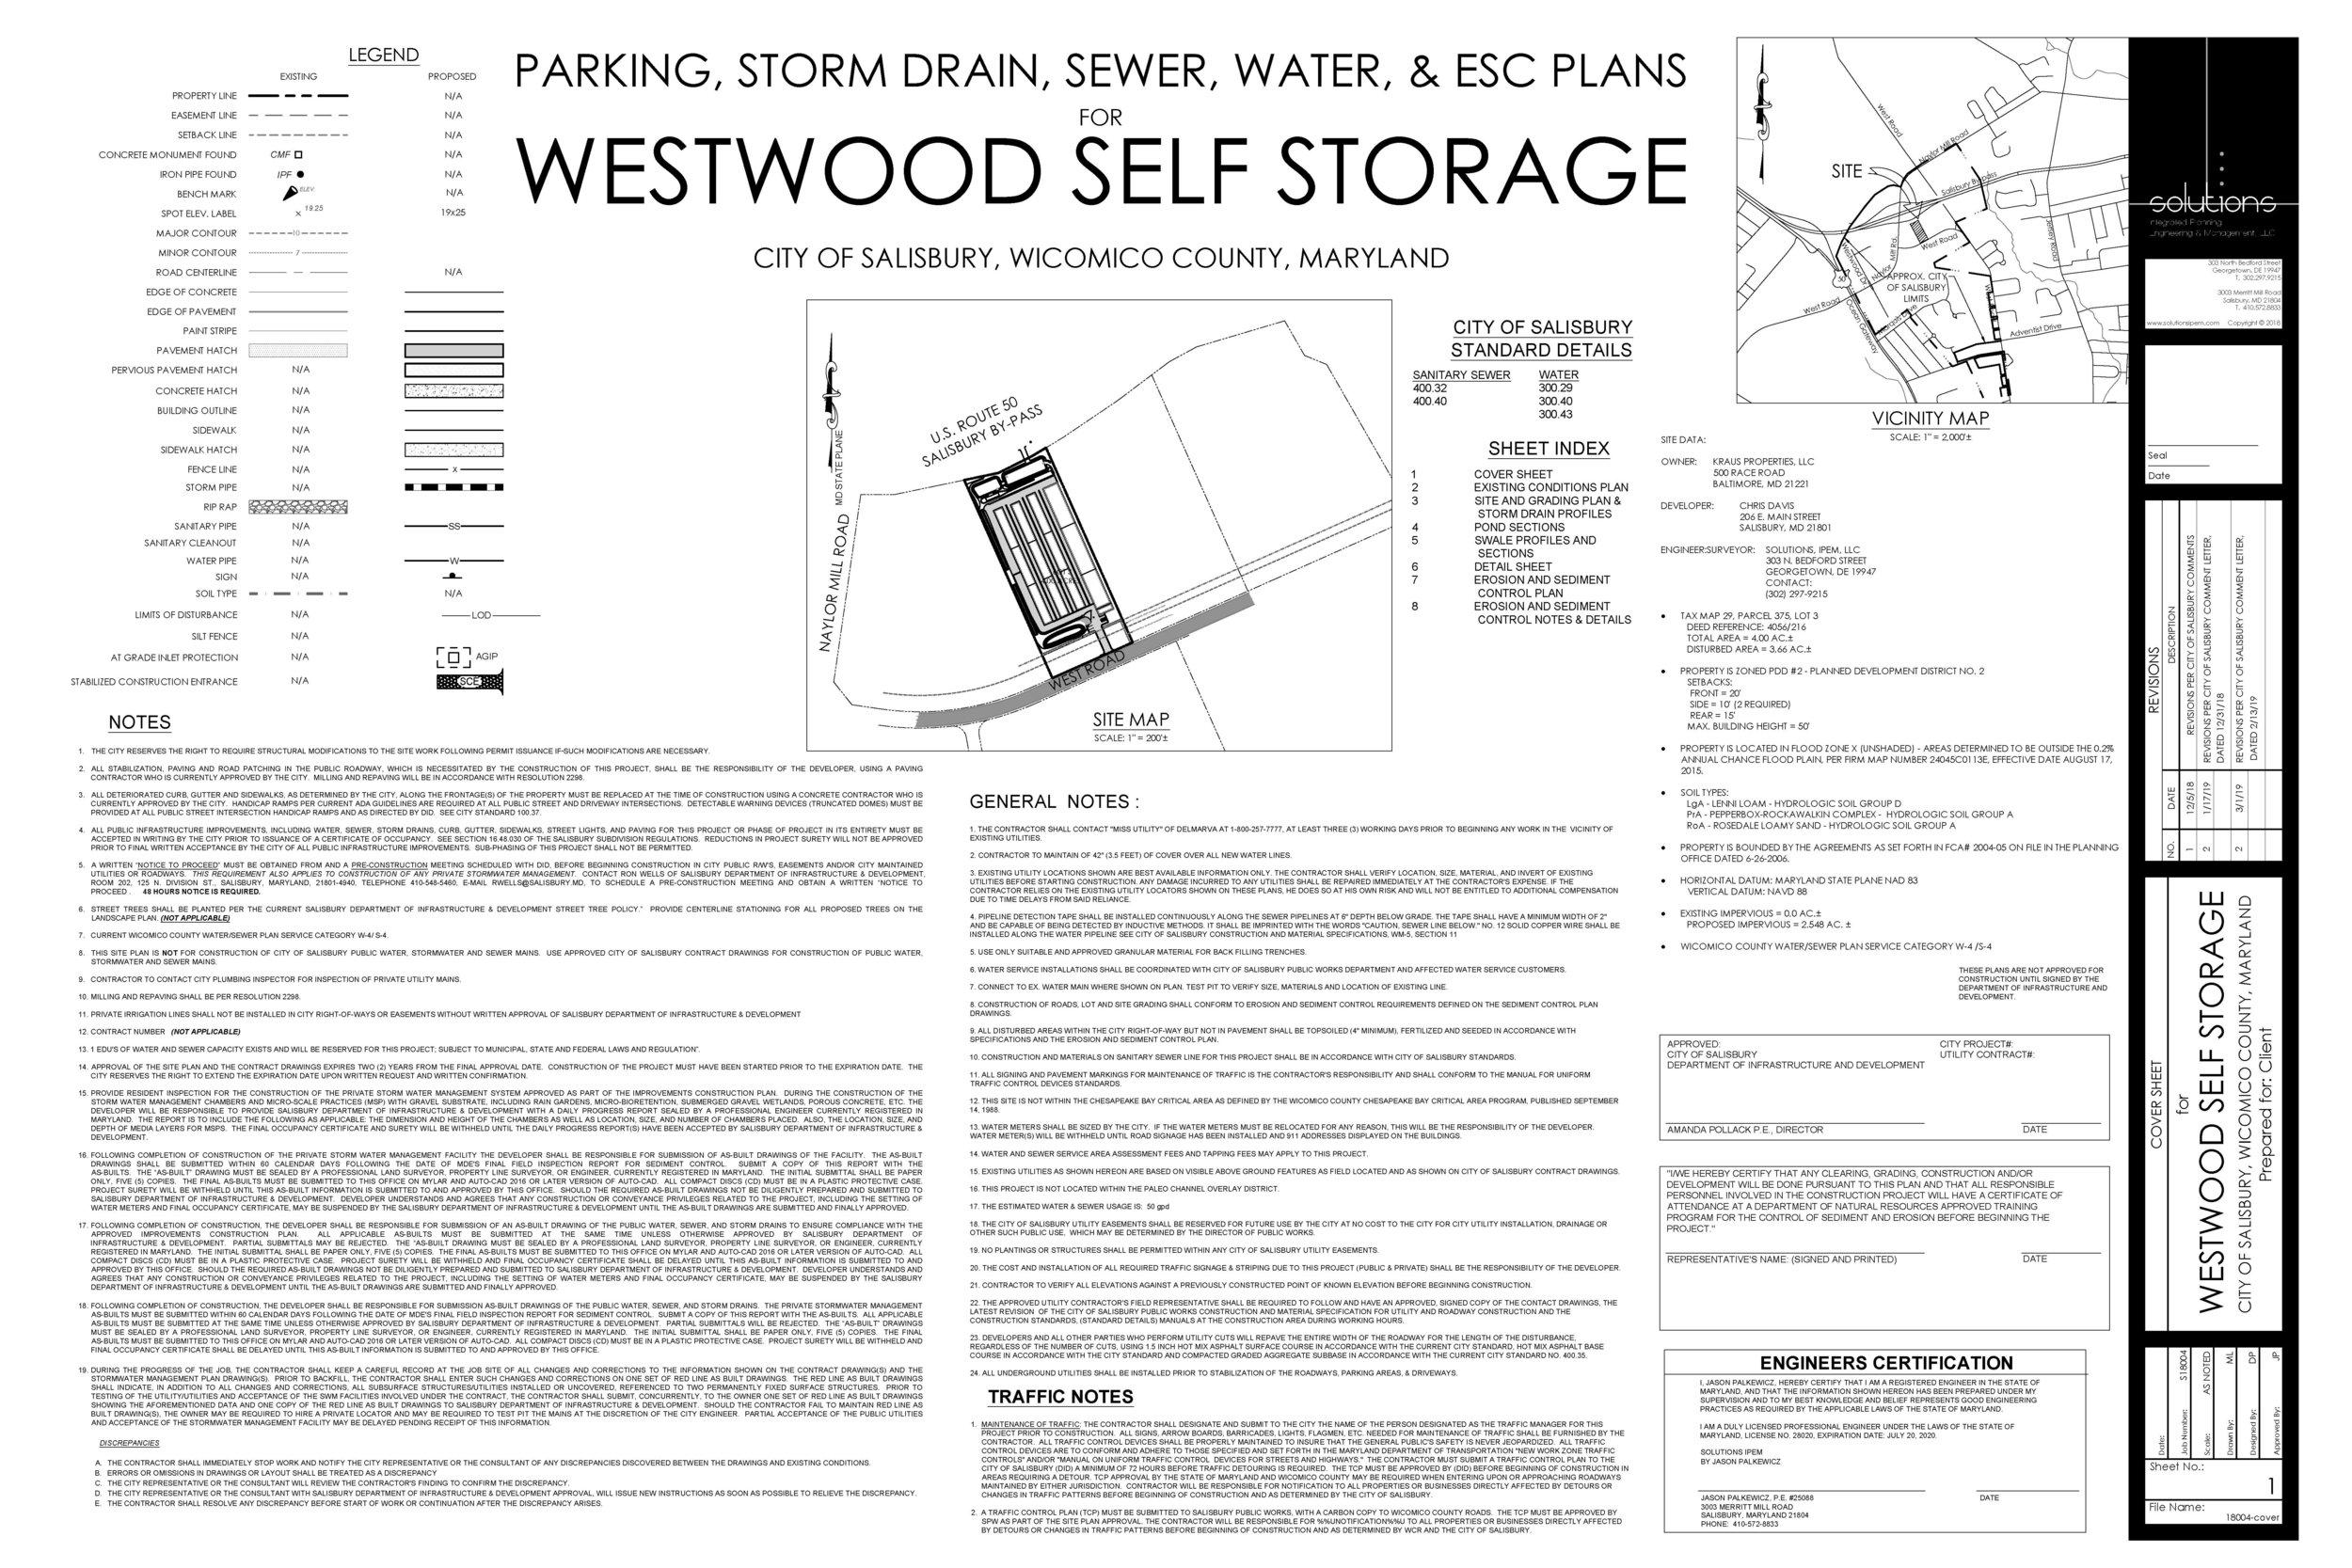 Westwood Self Storage - City of Salisbury, Maryland